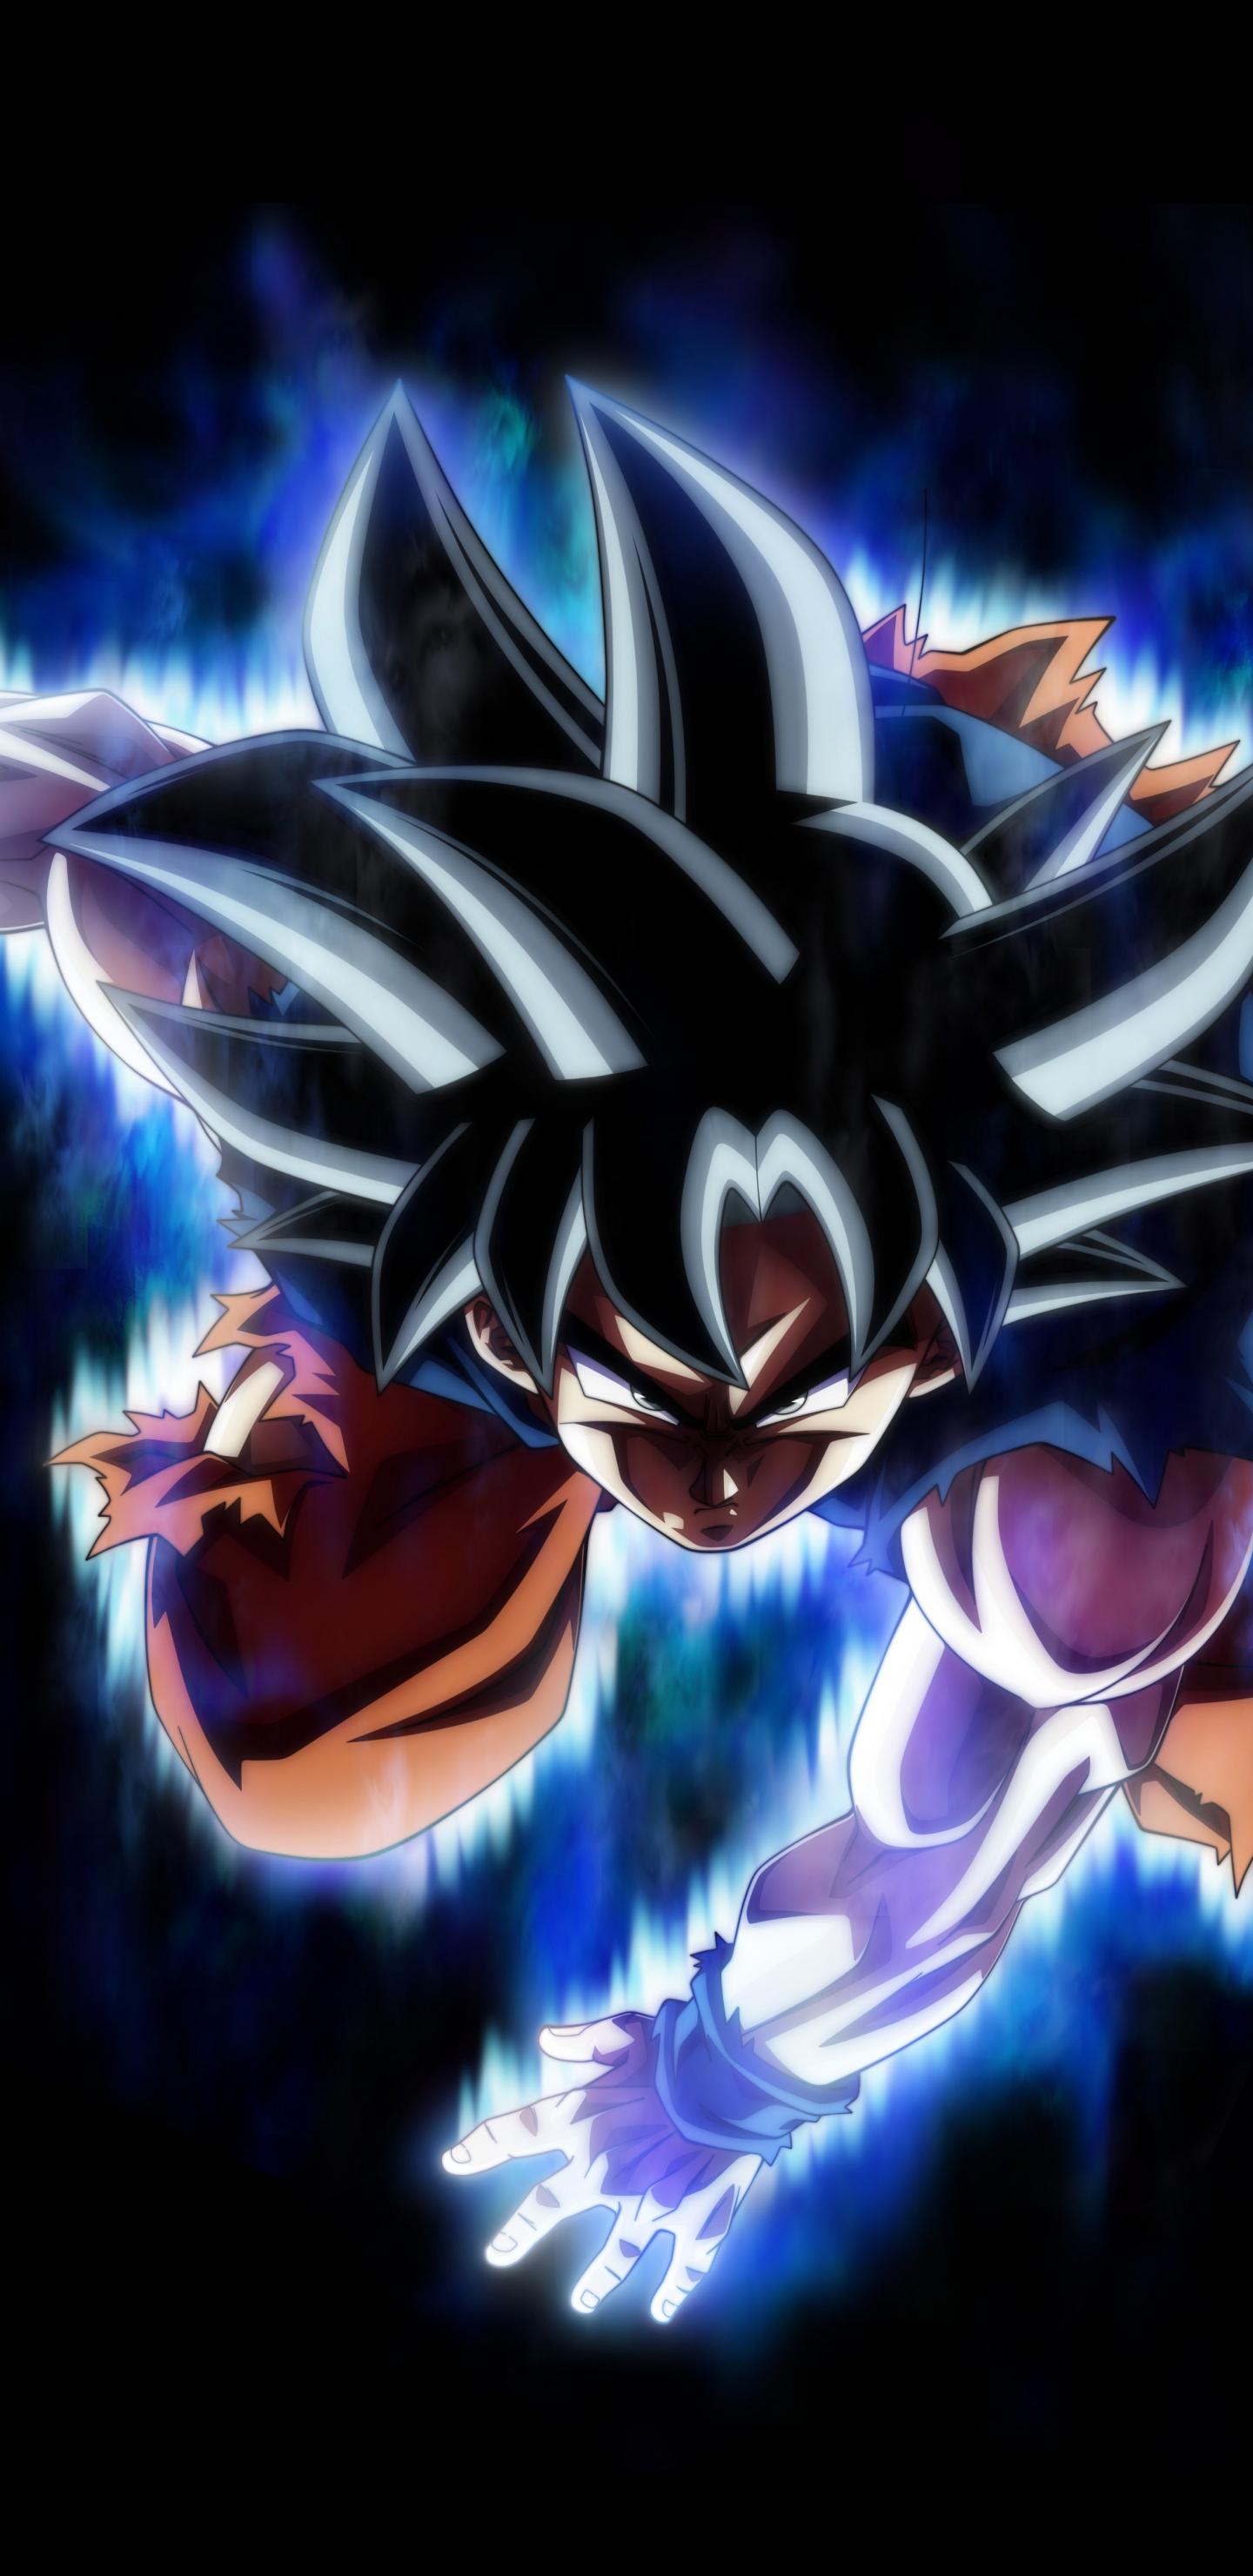 Download 1440x2960 Wallpaper Dragon Ball Super  Super Saiyan  Goku  Samsung Galaxy S8  Samsung